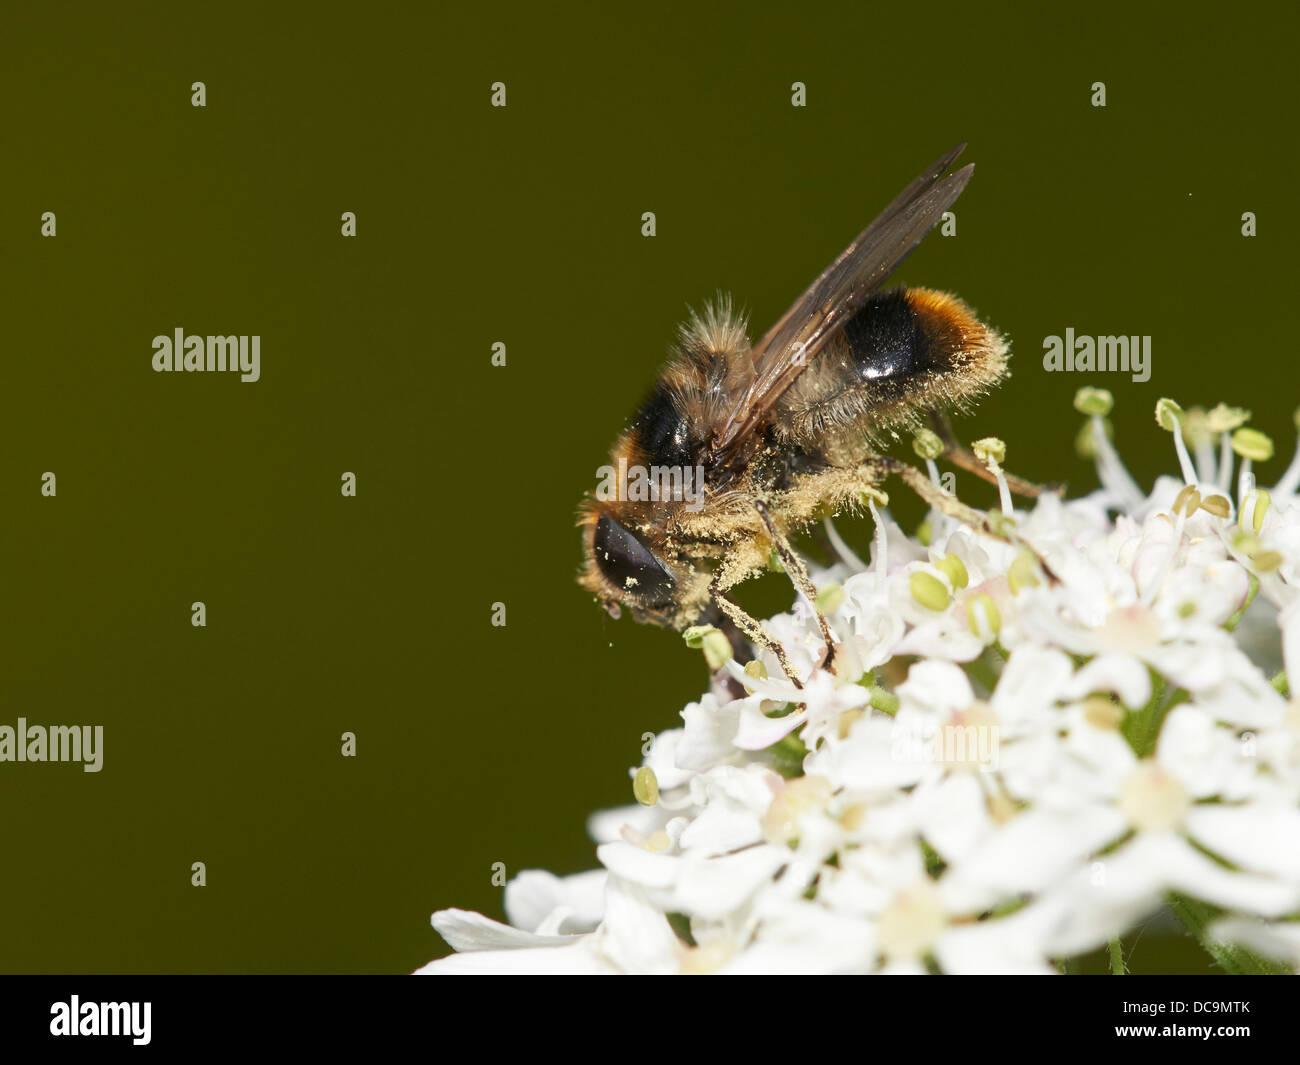 Bumblebee mimic Hoverfly feeding on nectar - Stock Image